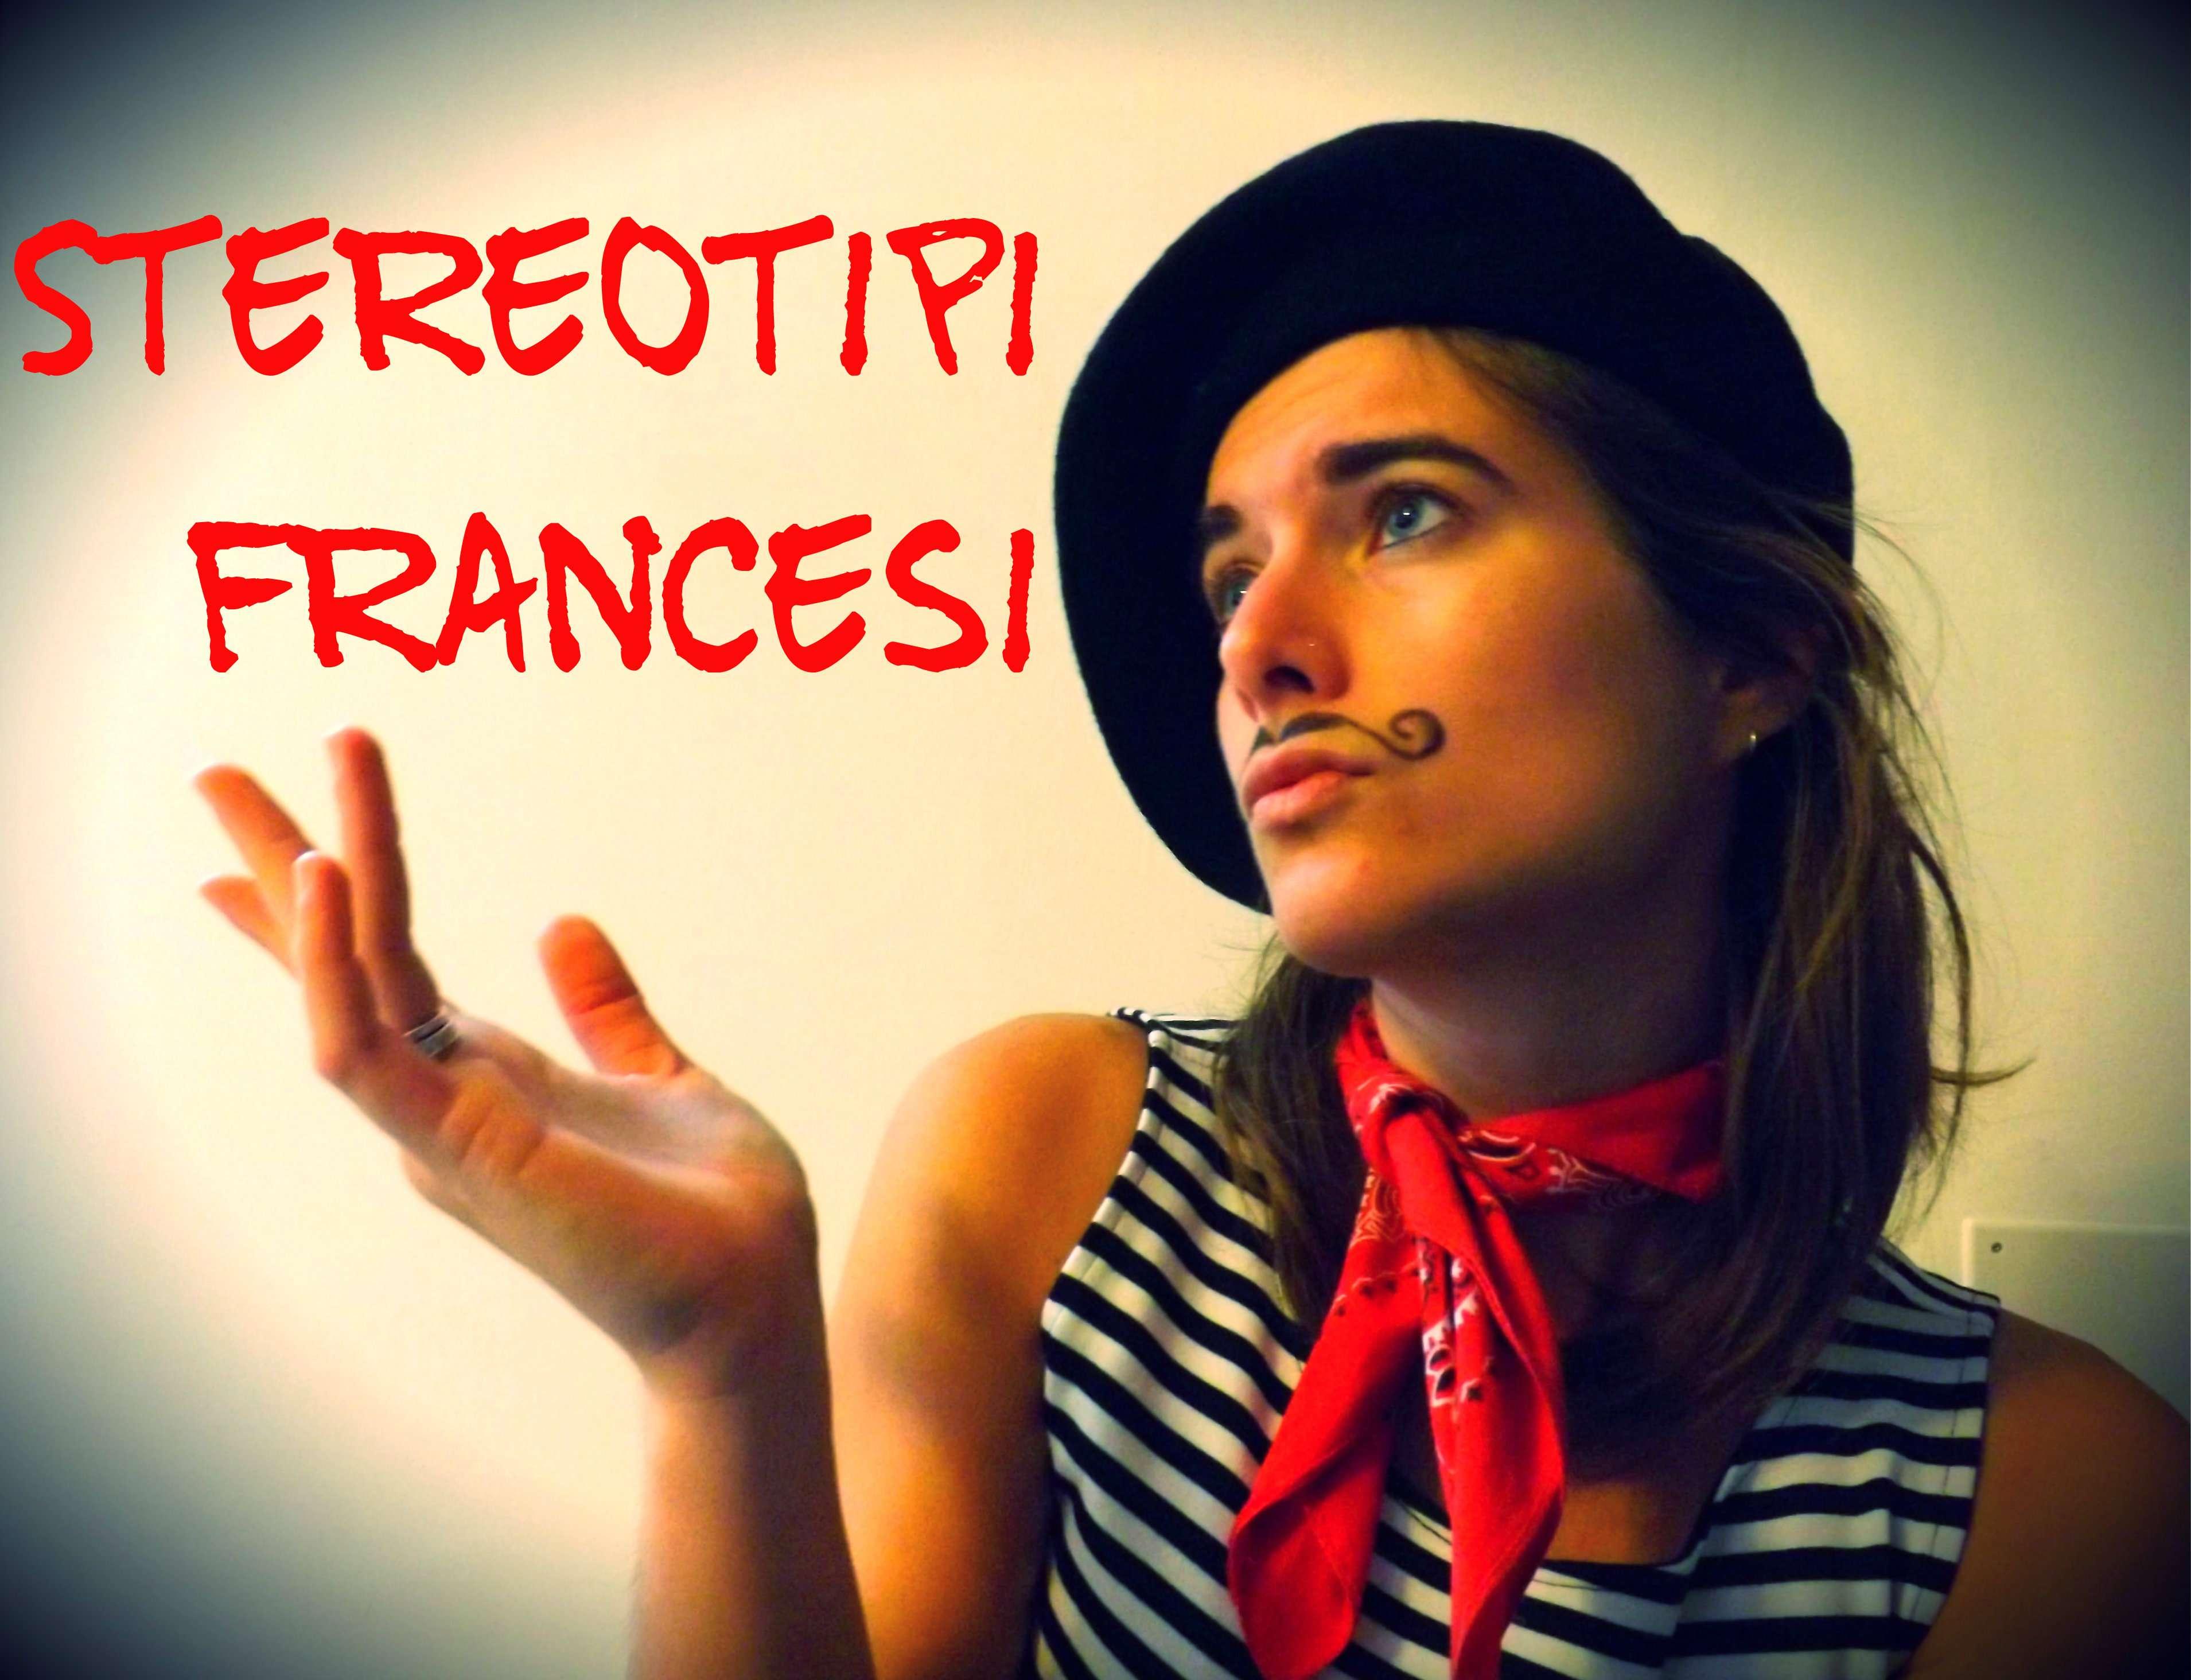 stereotipi francesi